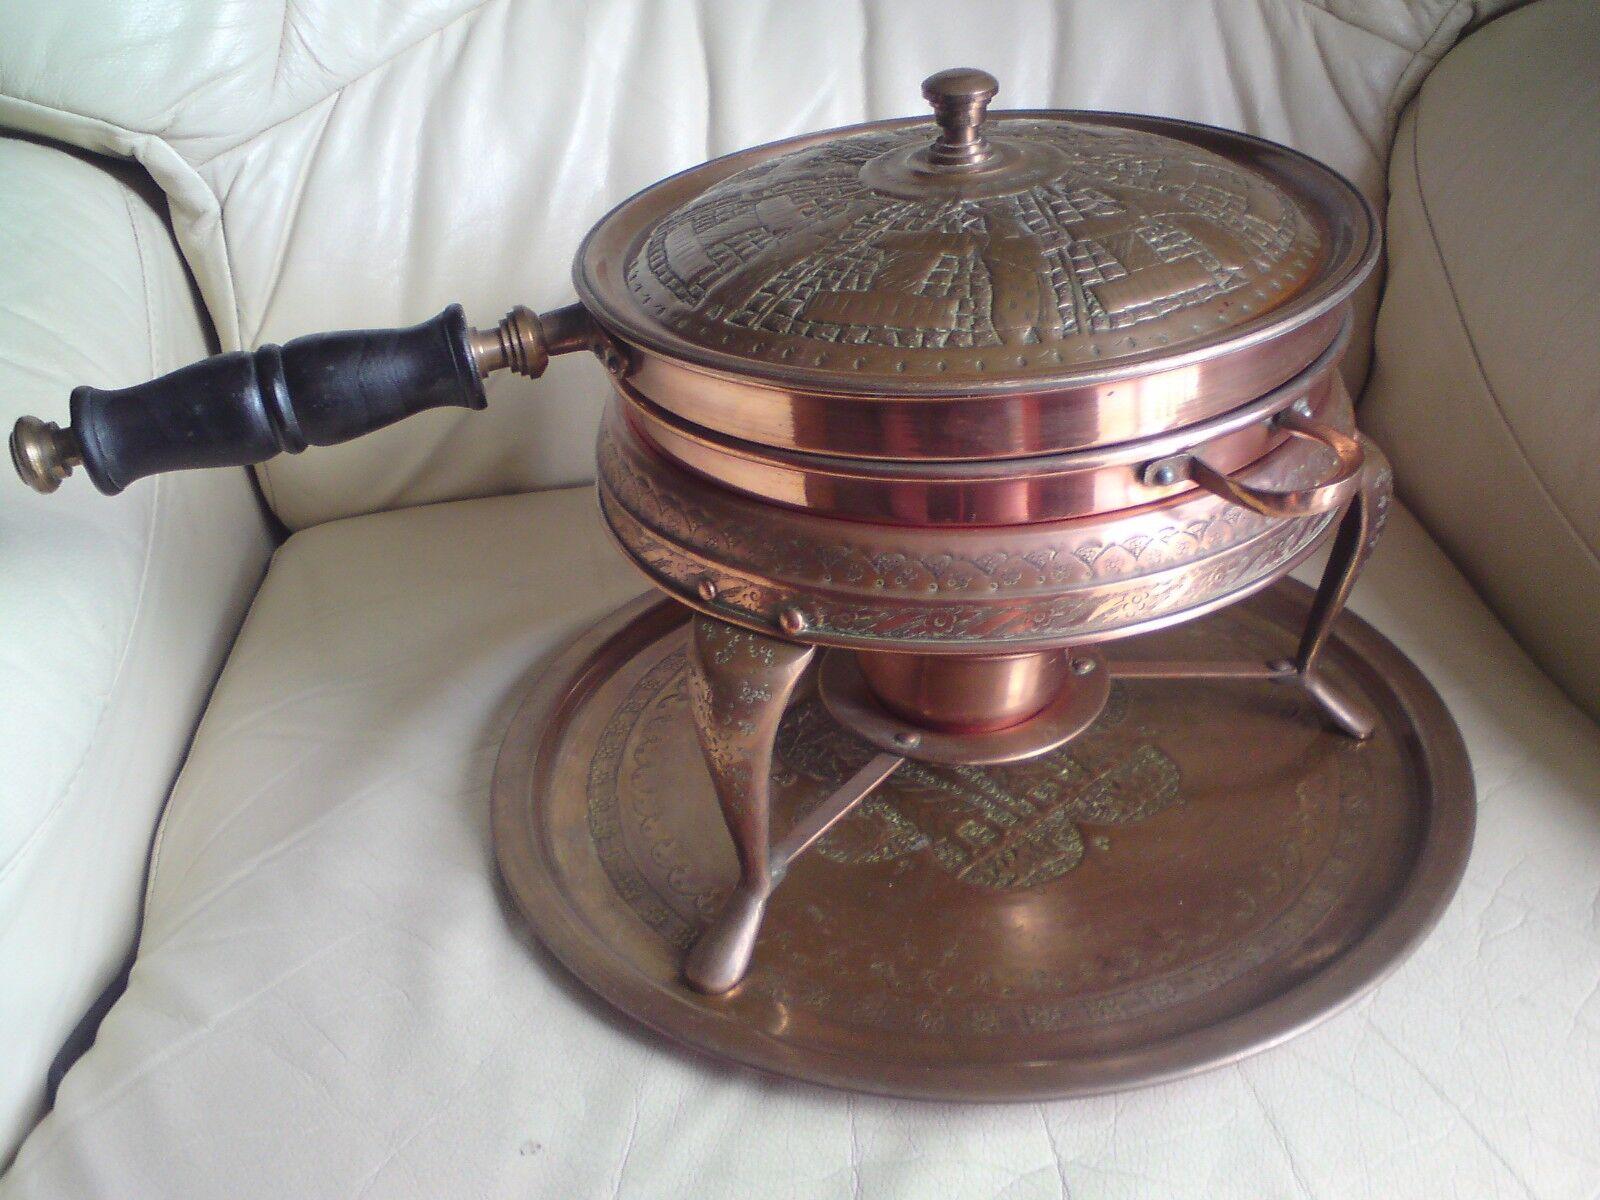 Vintage Nader Factory TéHéRAN IRAN Food Warmer Copper TIN LINED, utilisé.